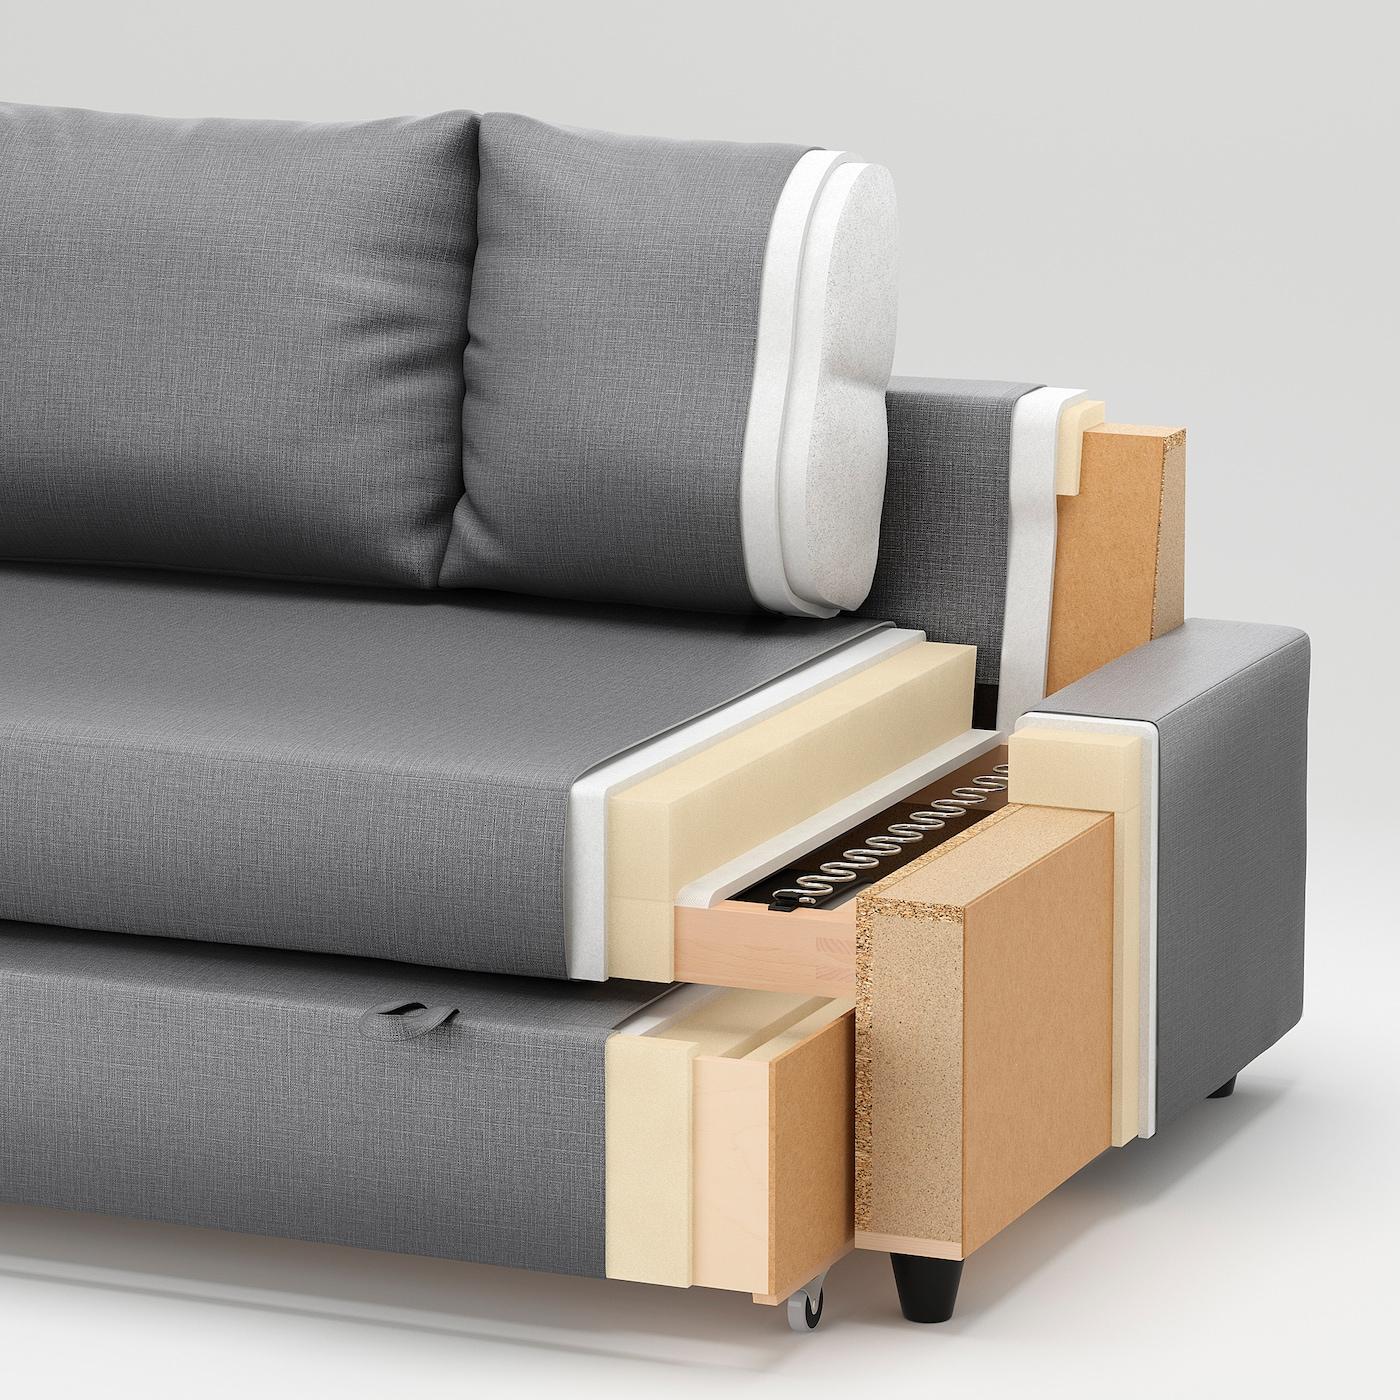 FRIHETEN Corner sofa-bed with storage - Skiftebo dark gray